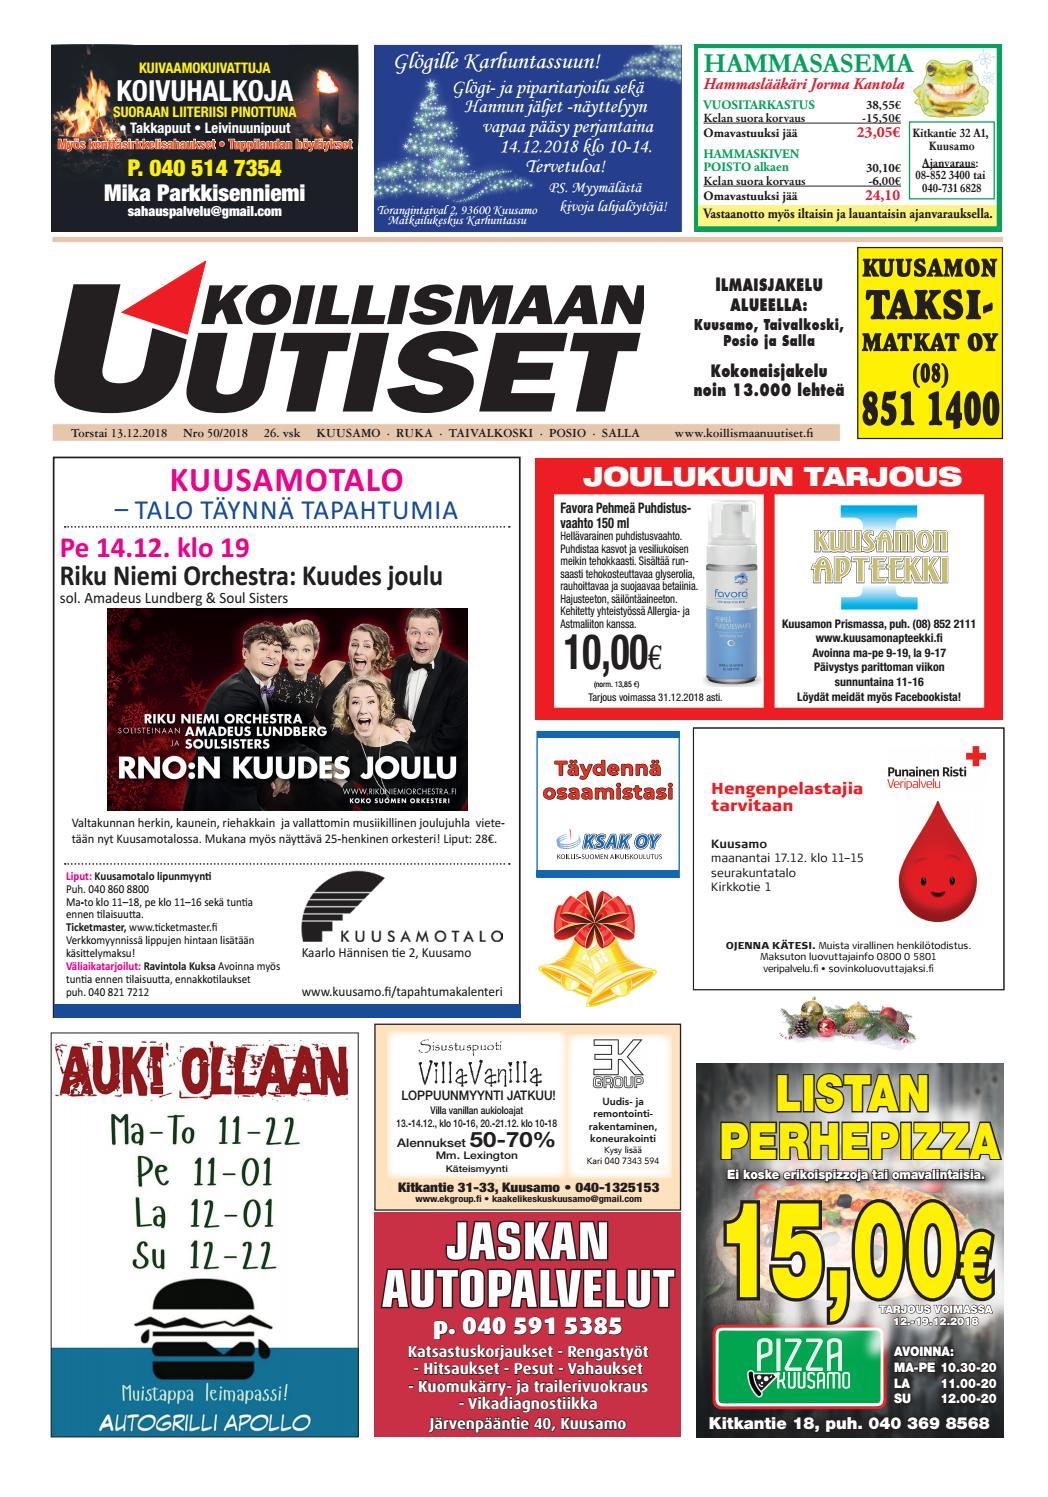 Anaali hard Naiset honkaranta aamulehti hd download kuuma free indian tuplapotti.